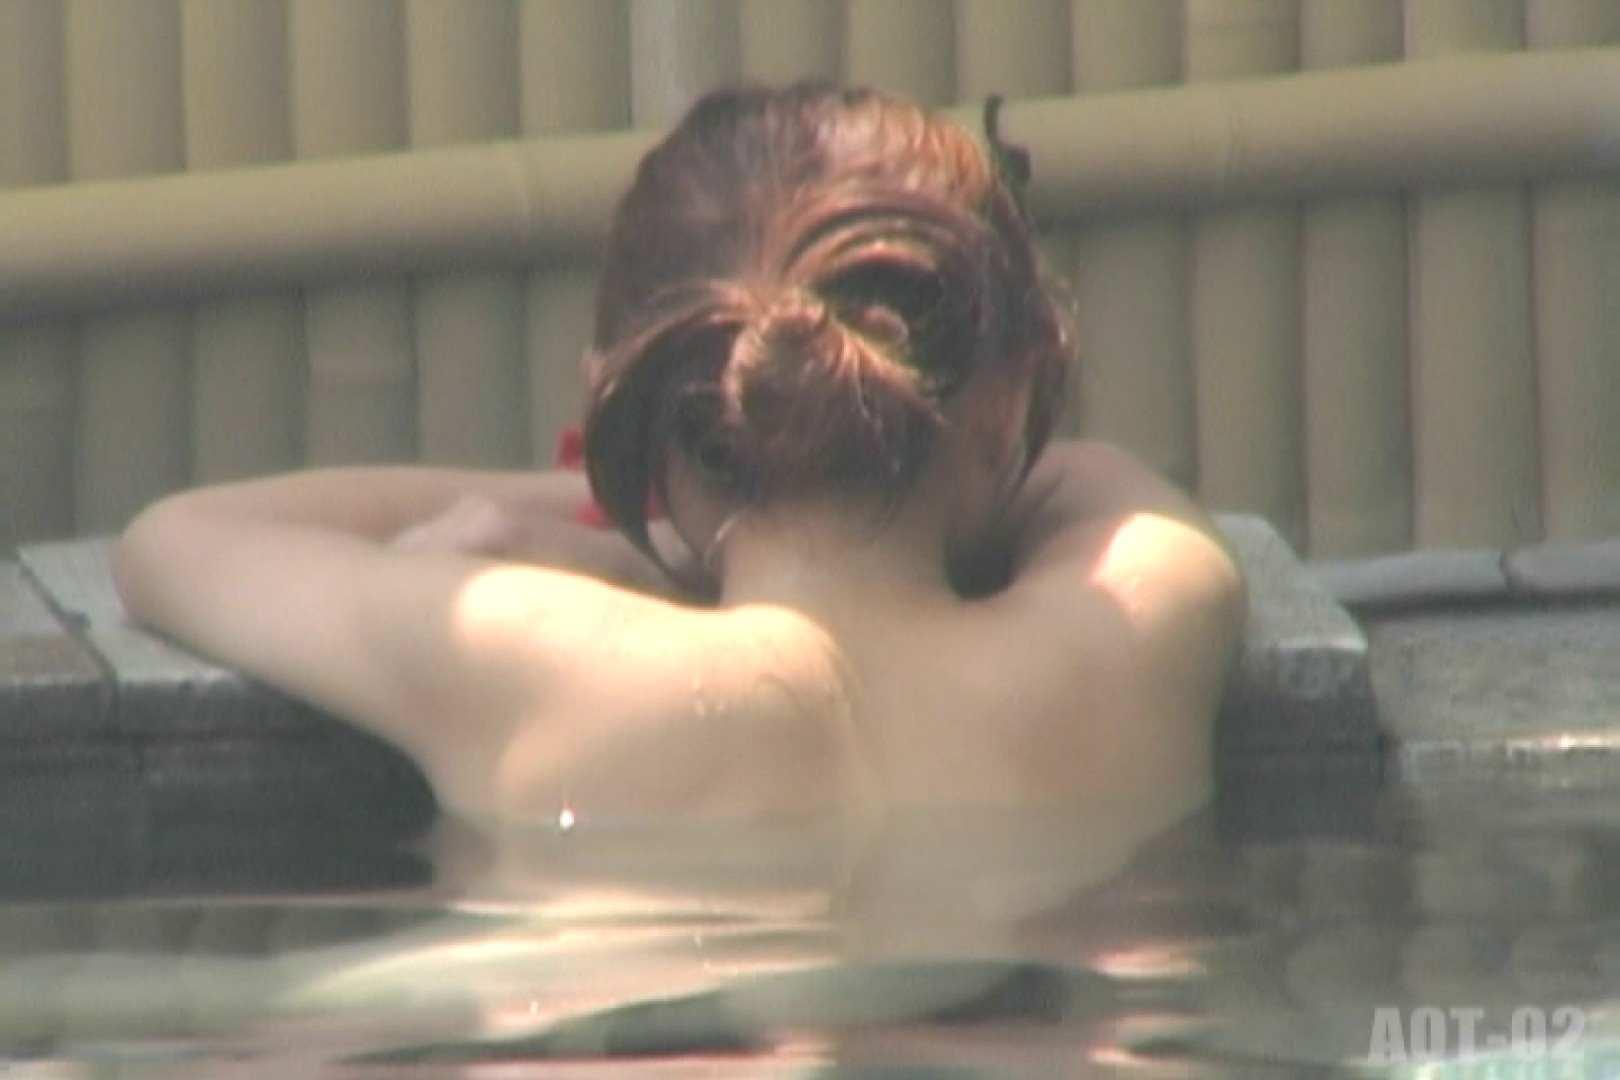 Aquaな露天風呂Vol.726 OLのエロ生活 おまんこ無修正動画無料 84連発 32